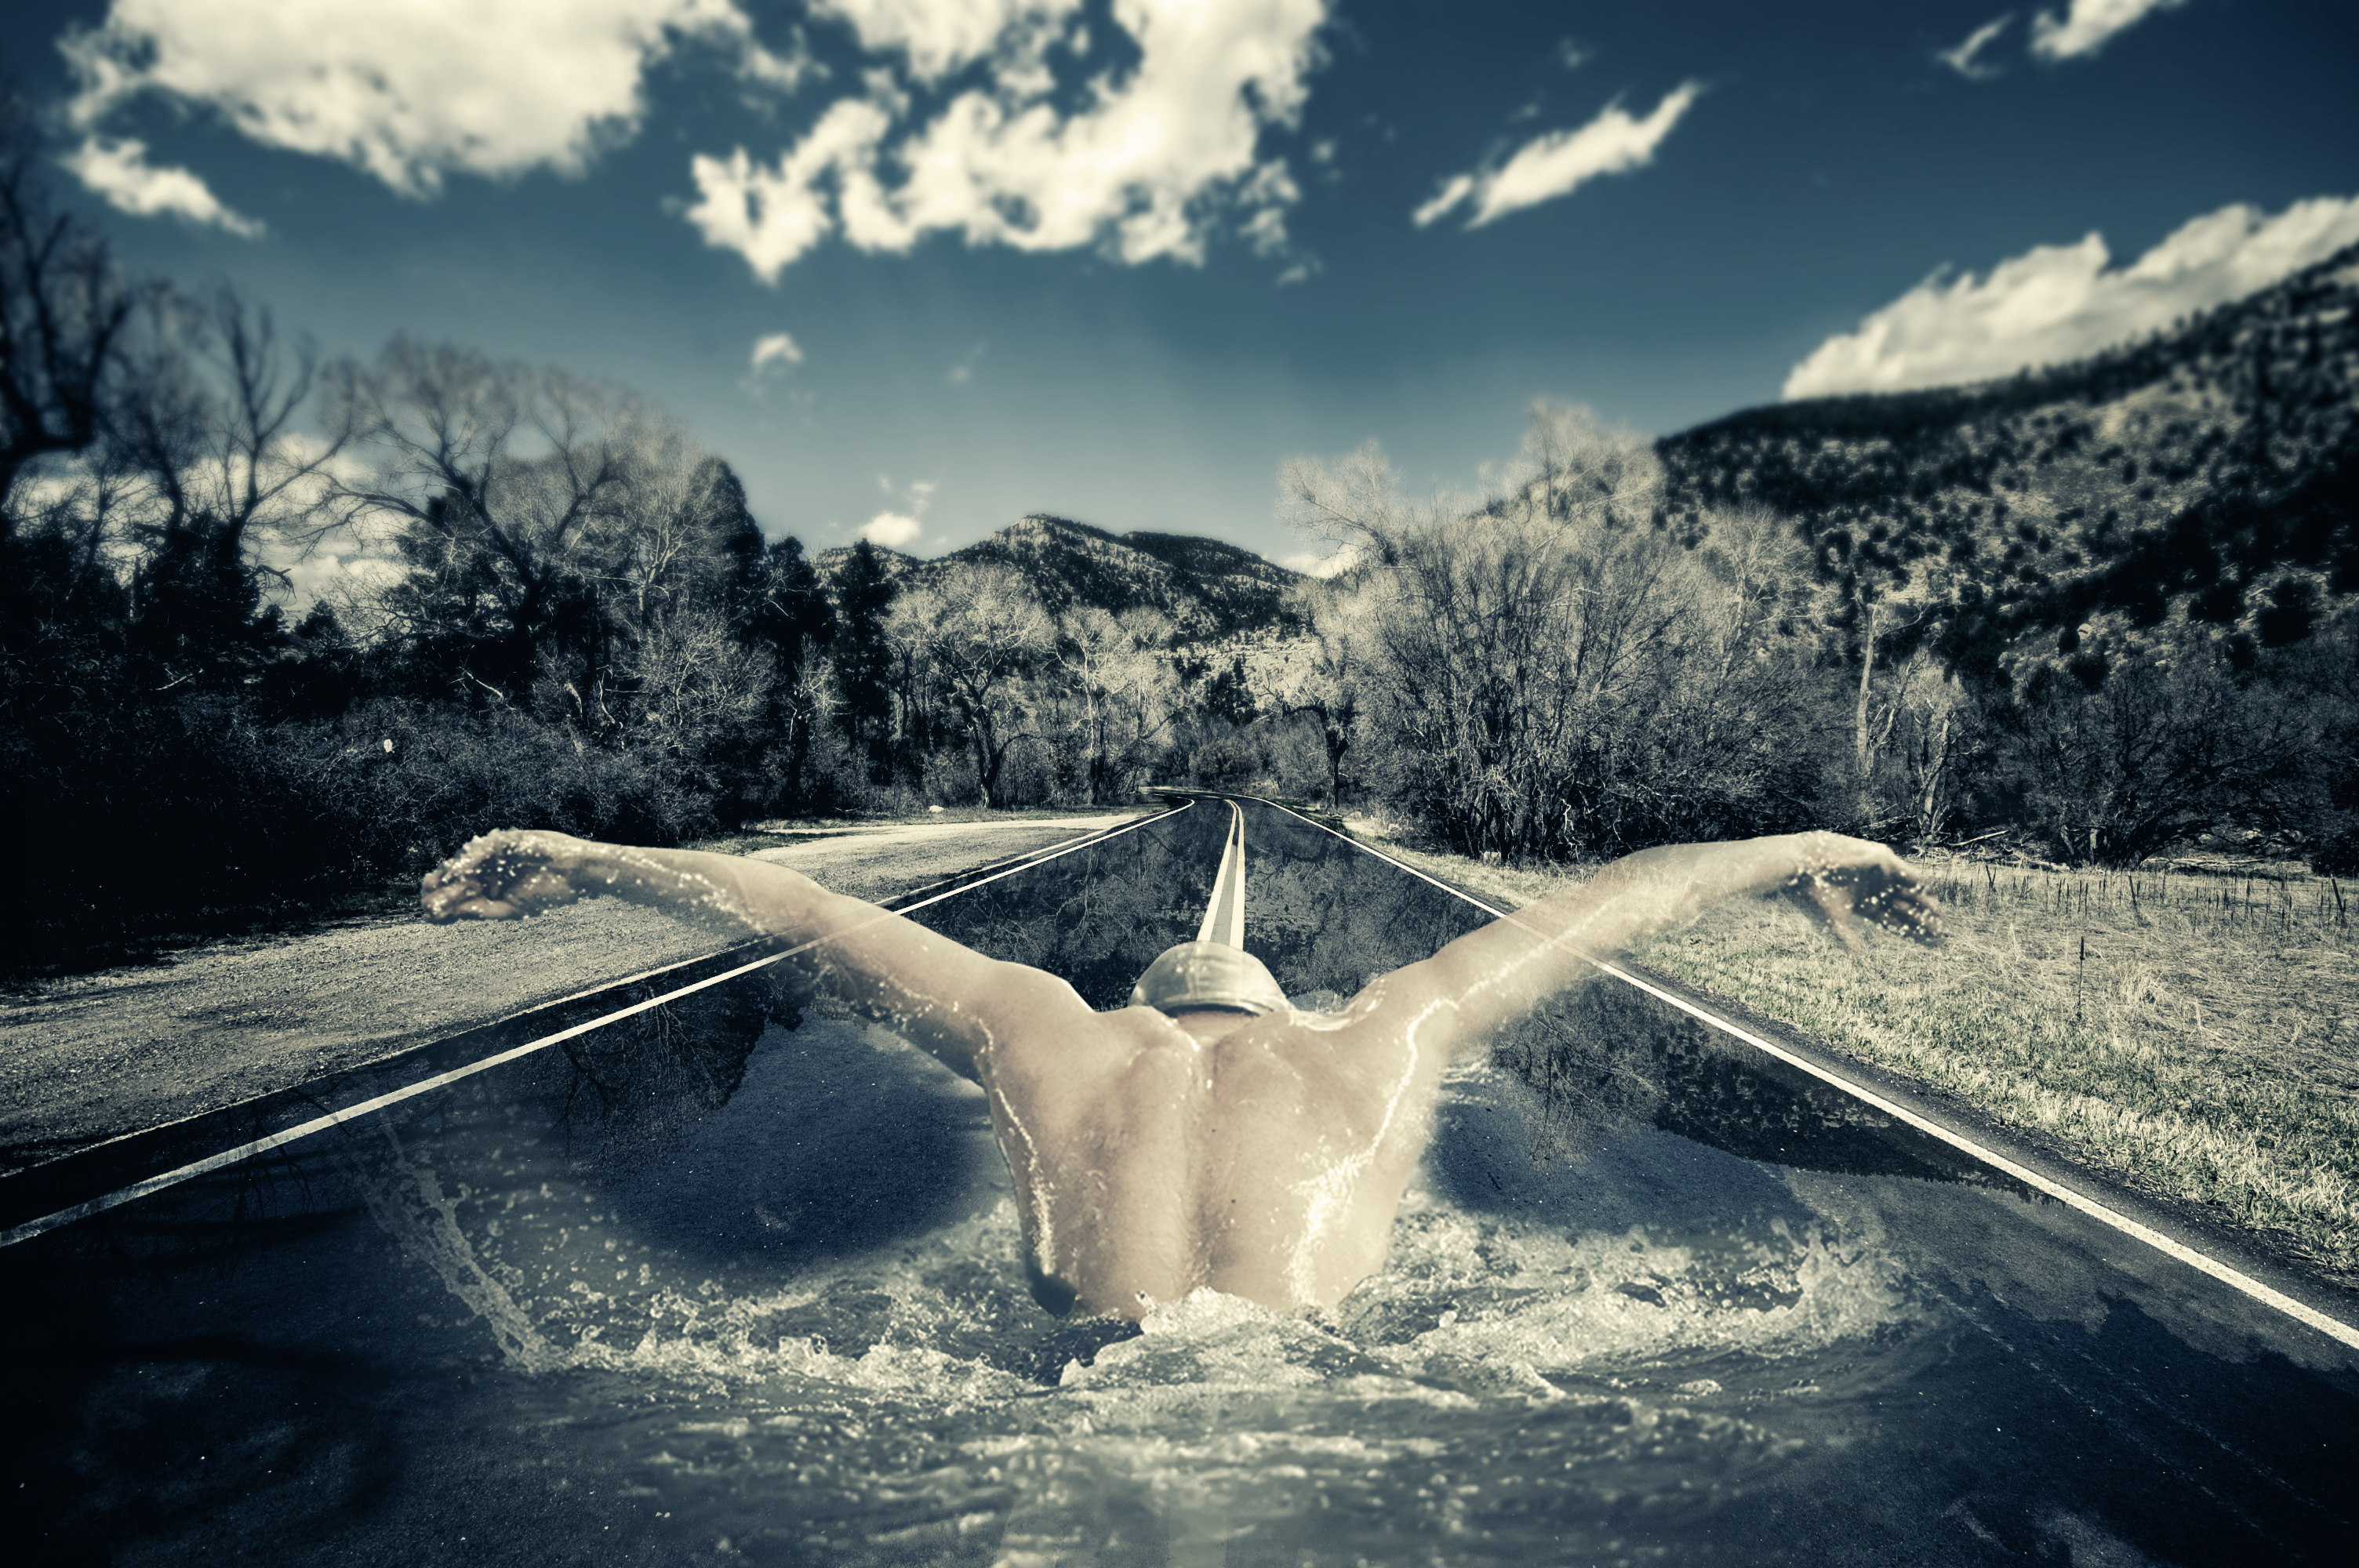 Road swimmer